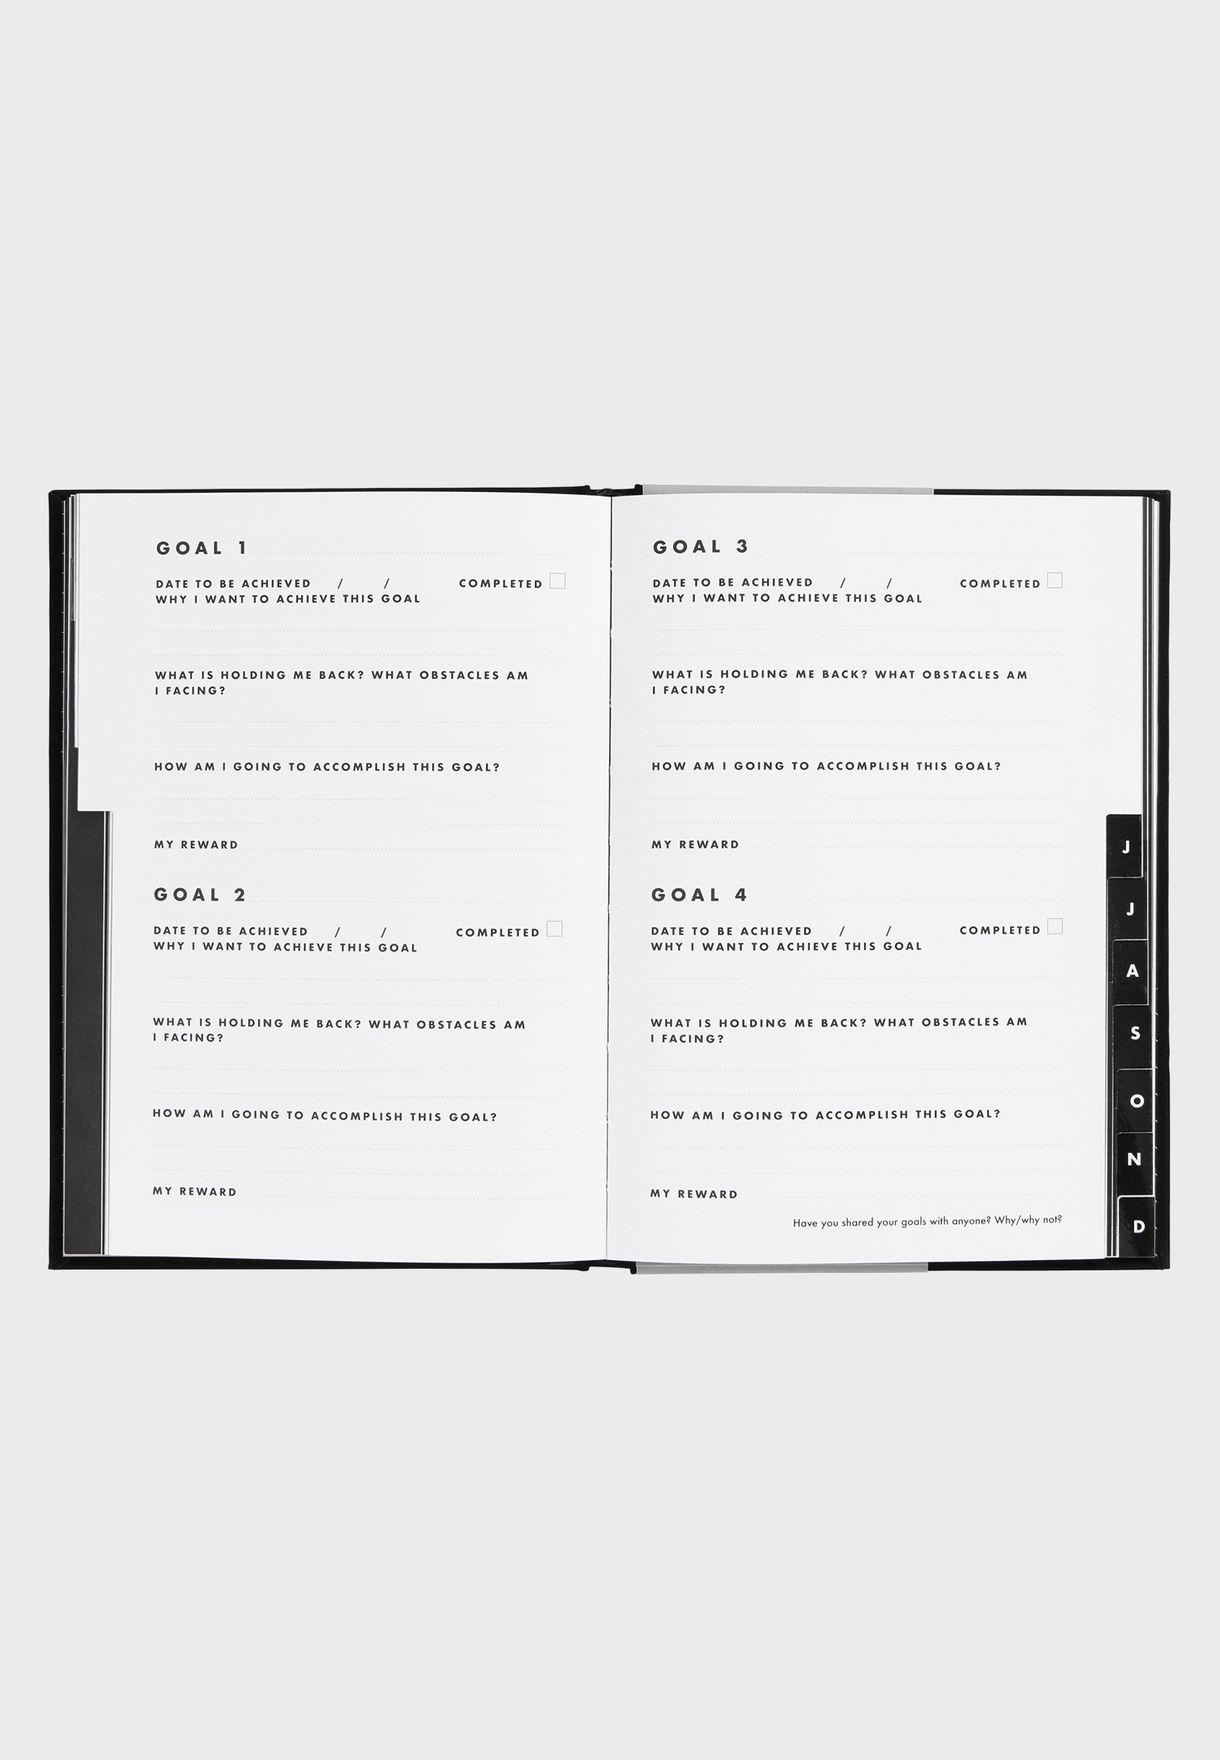 دفتر يوميات